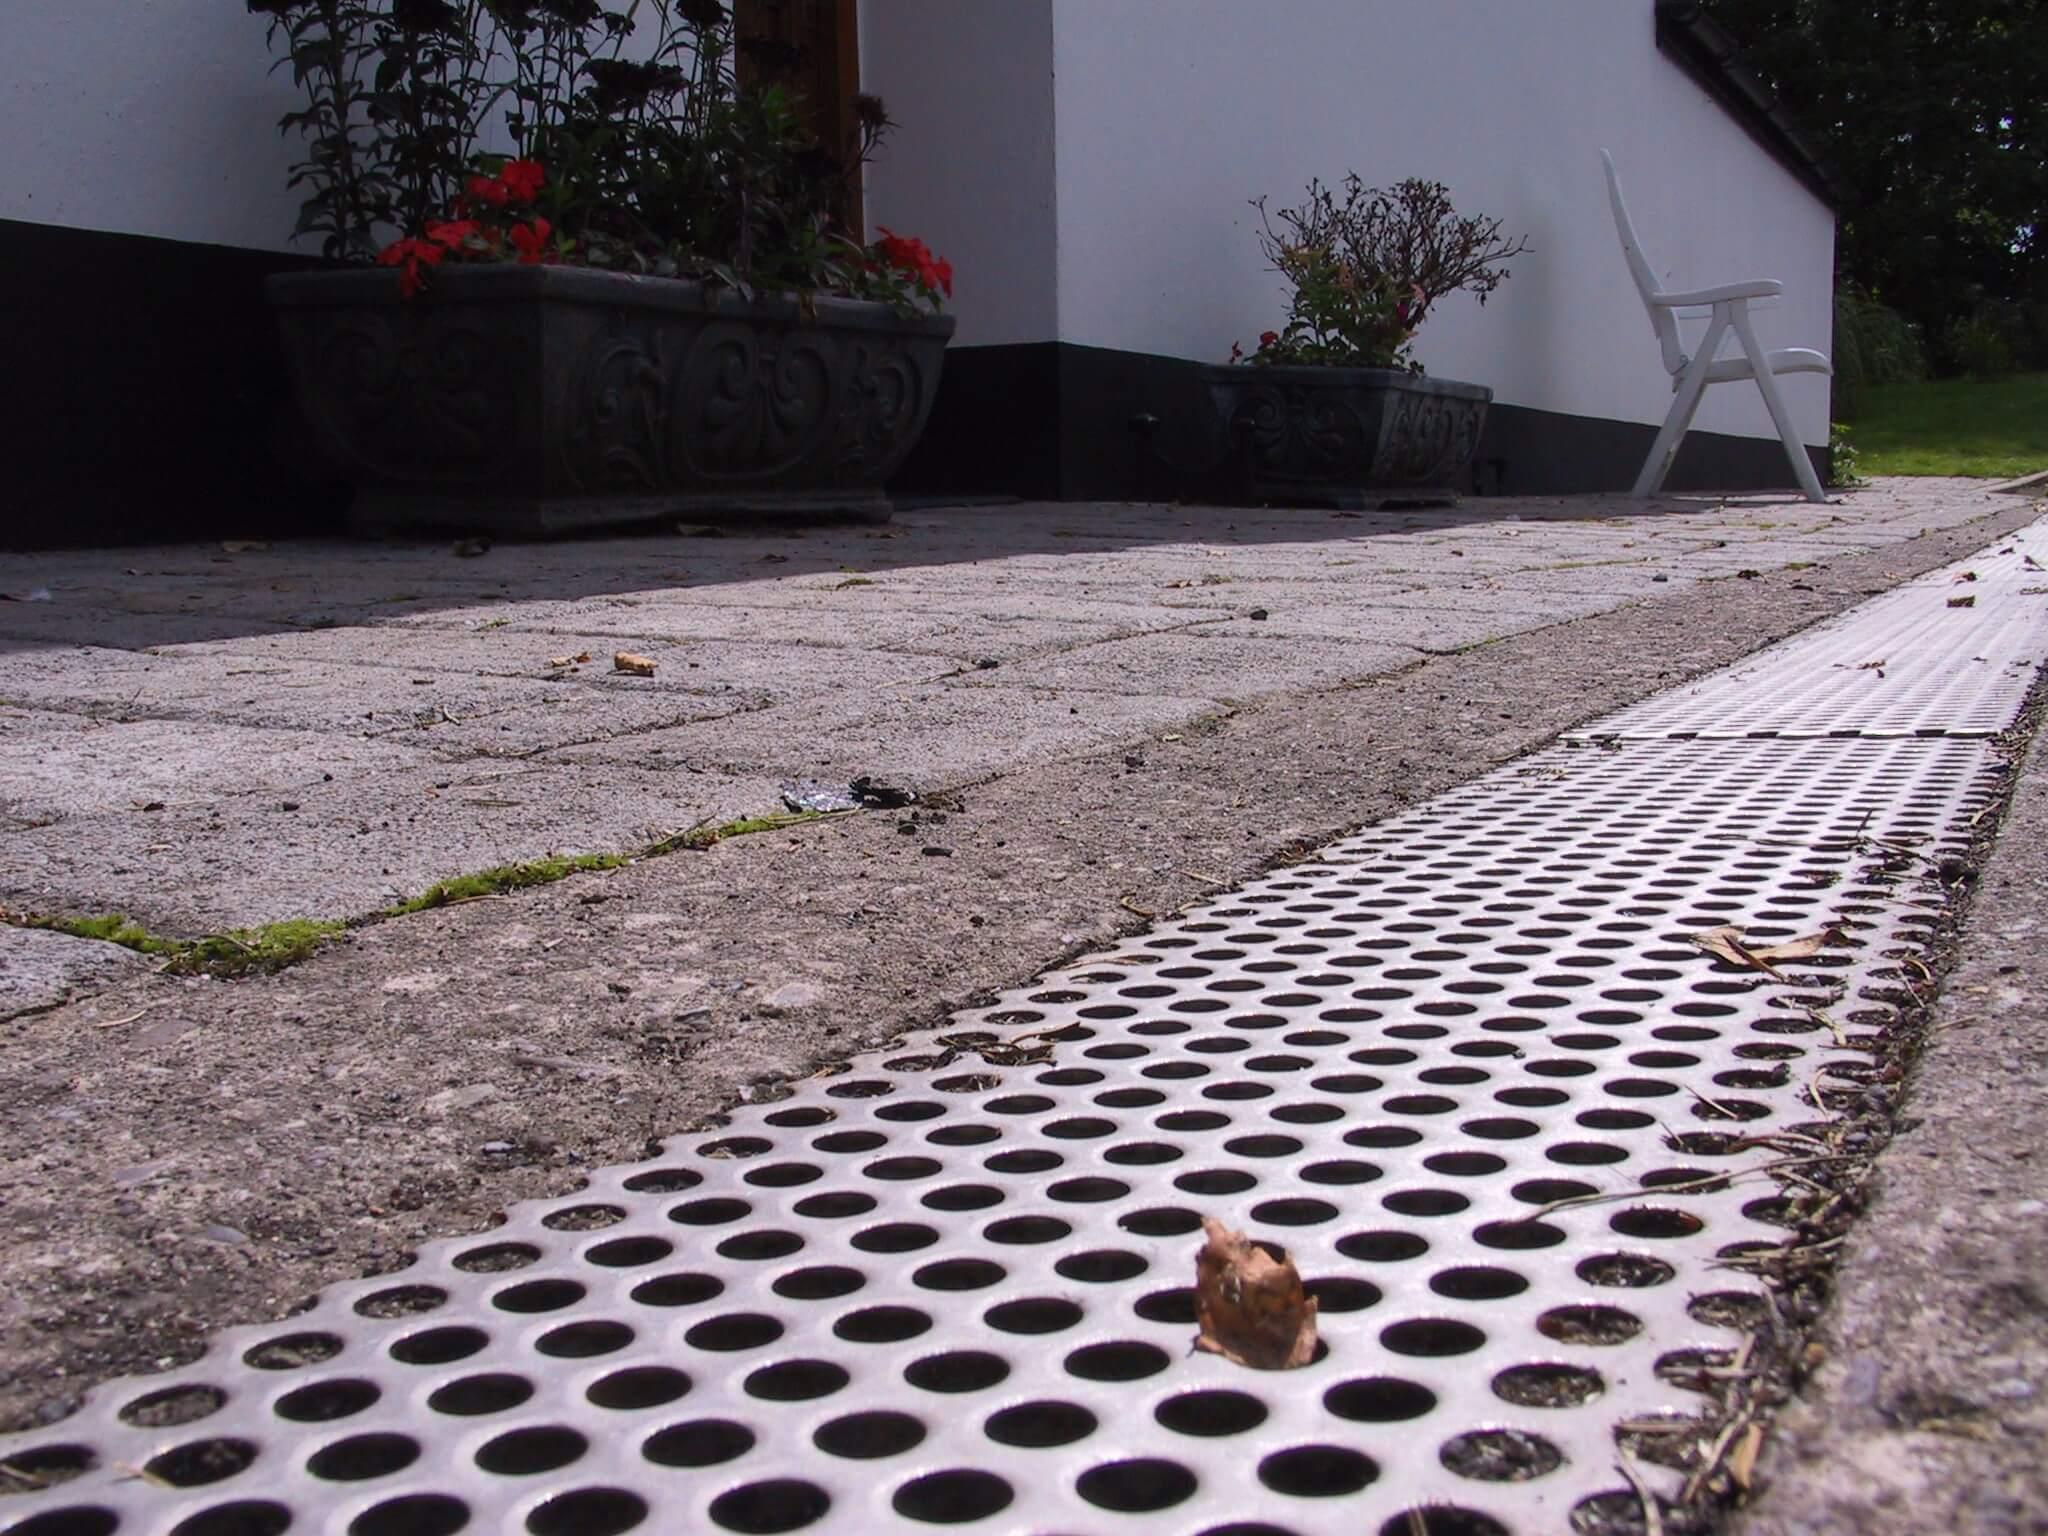 Stainless steel drain